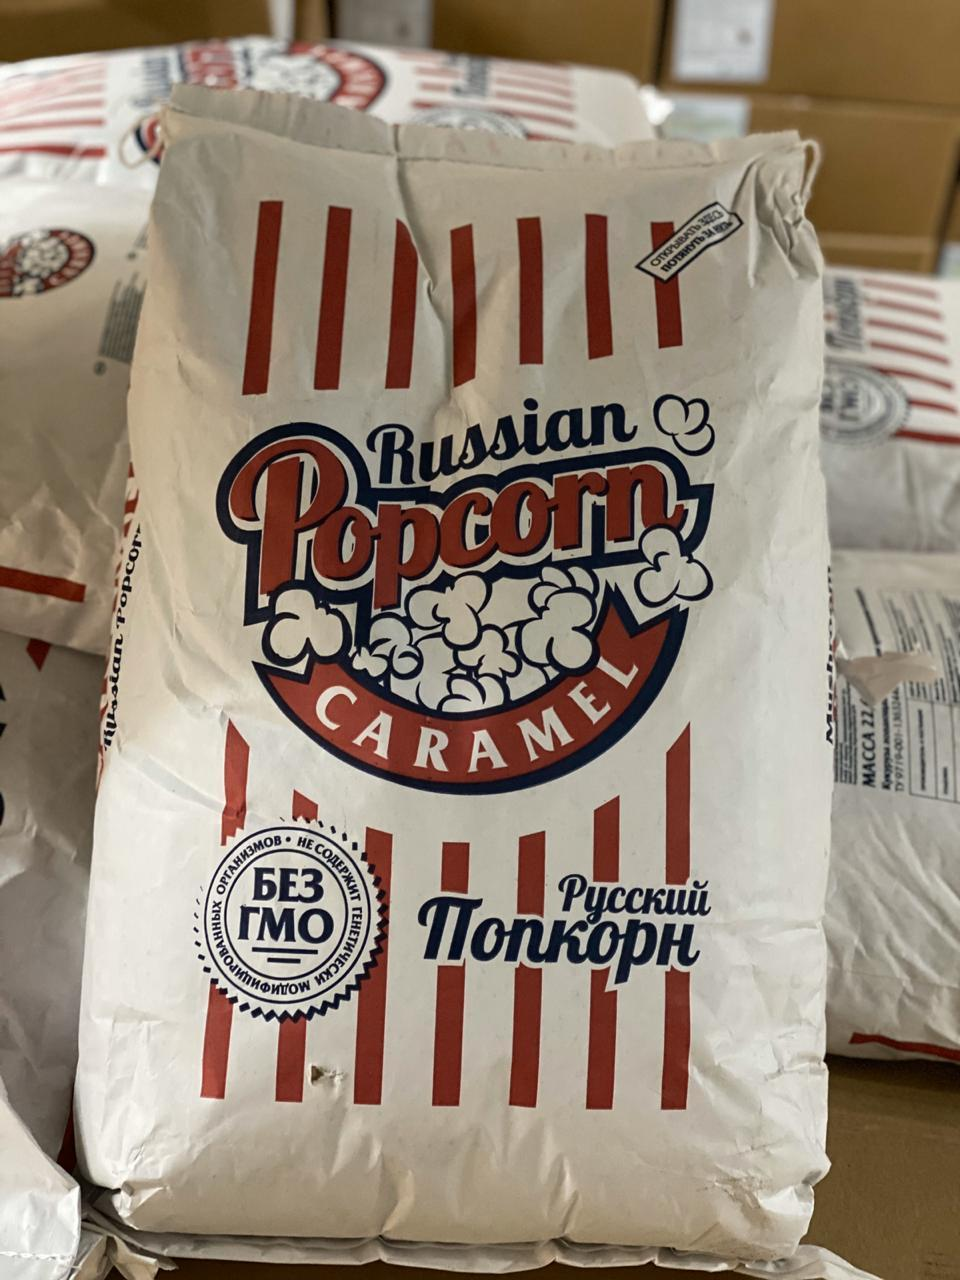 Зерна попкорна Карамель / Гриб